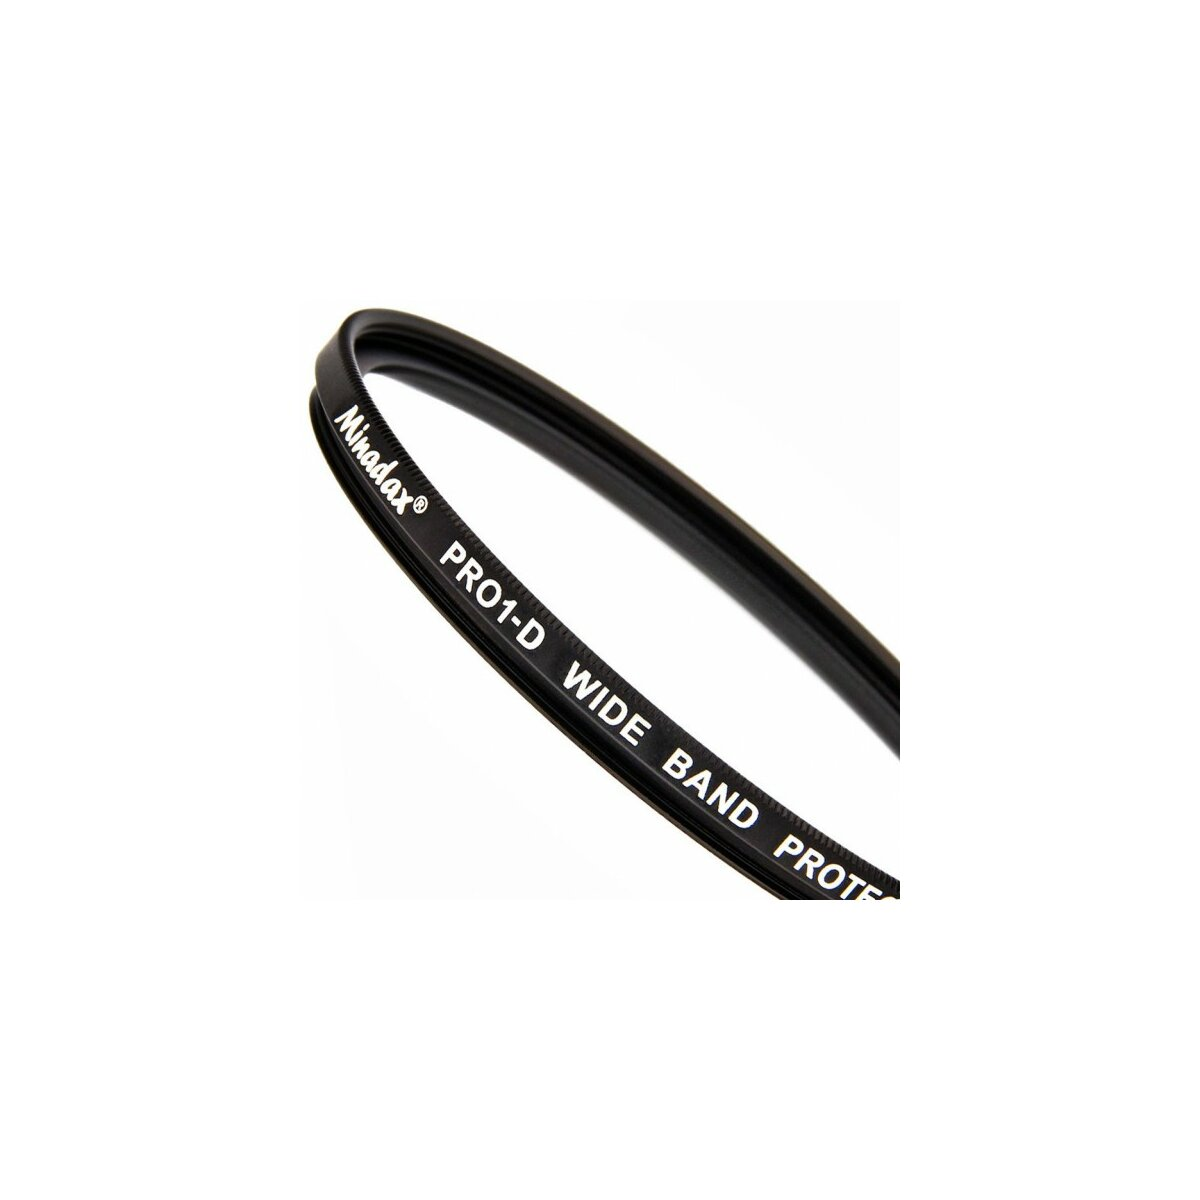 Protector Filter 62mm PRO-1D Slimline, Schutzfilter - mehrfachverguetet